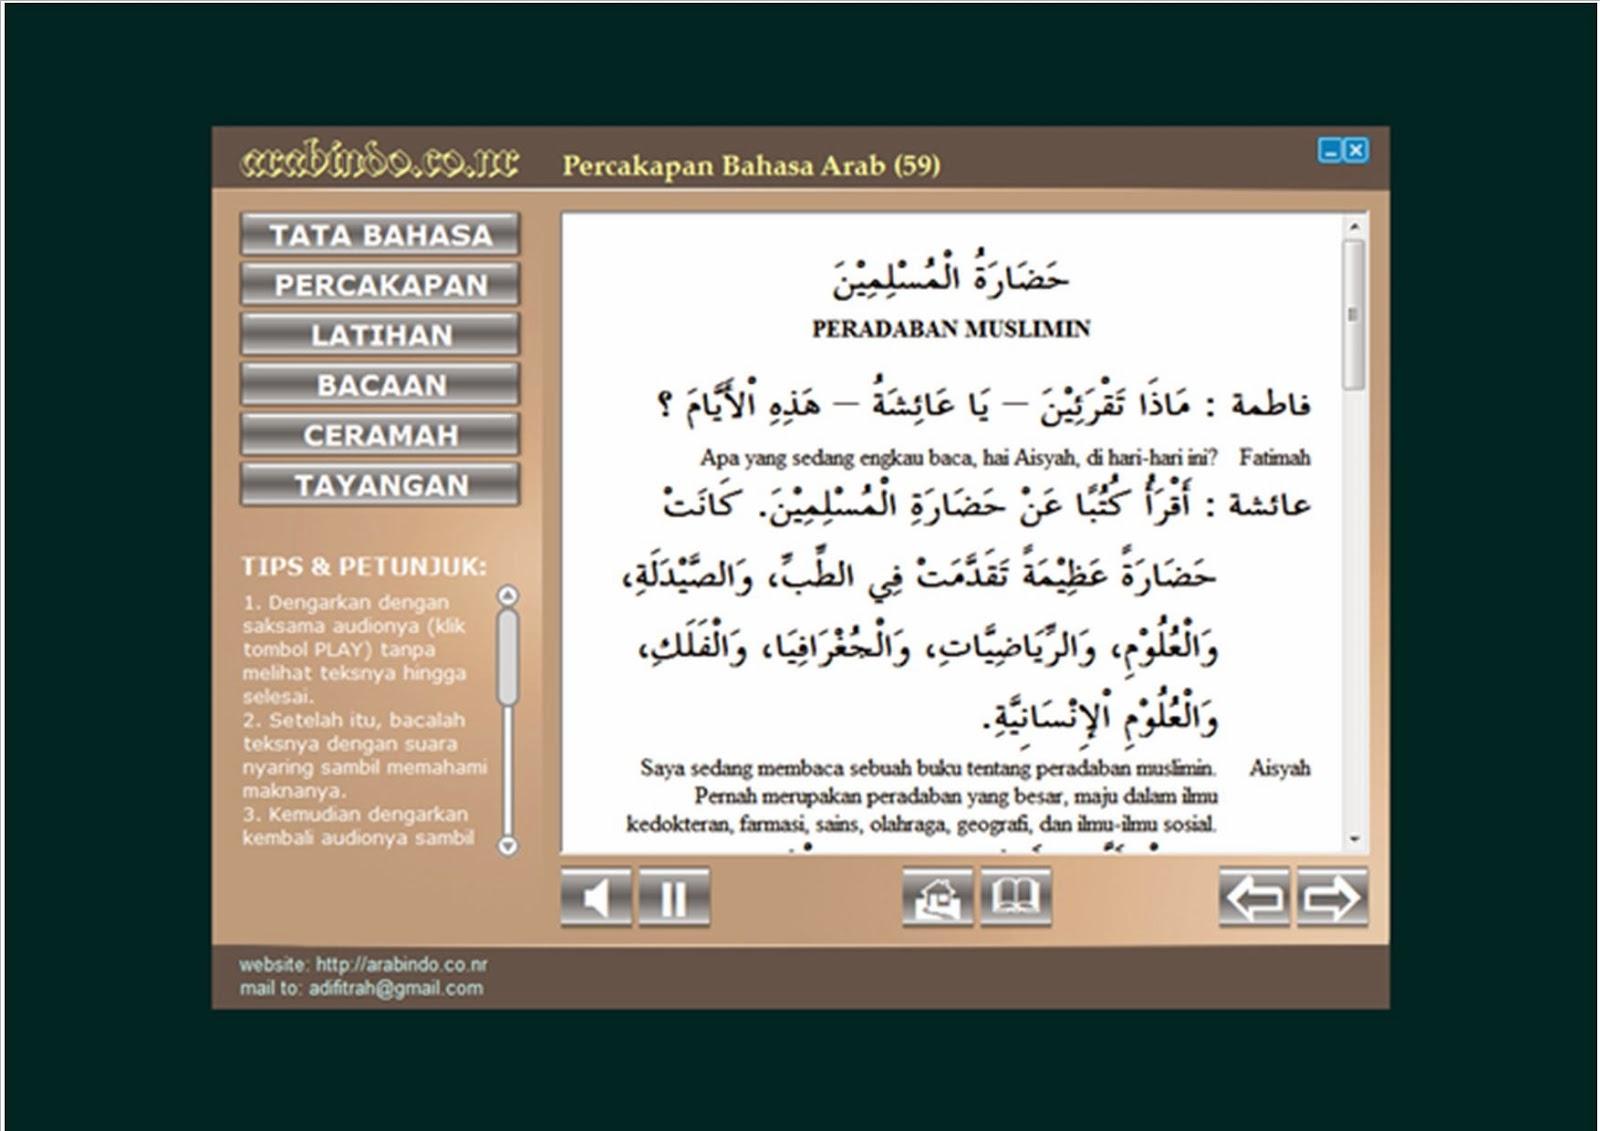 Media Pembelajaran Bahasa Arab Digital Terlengkap